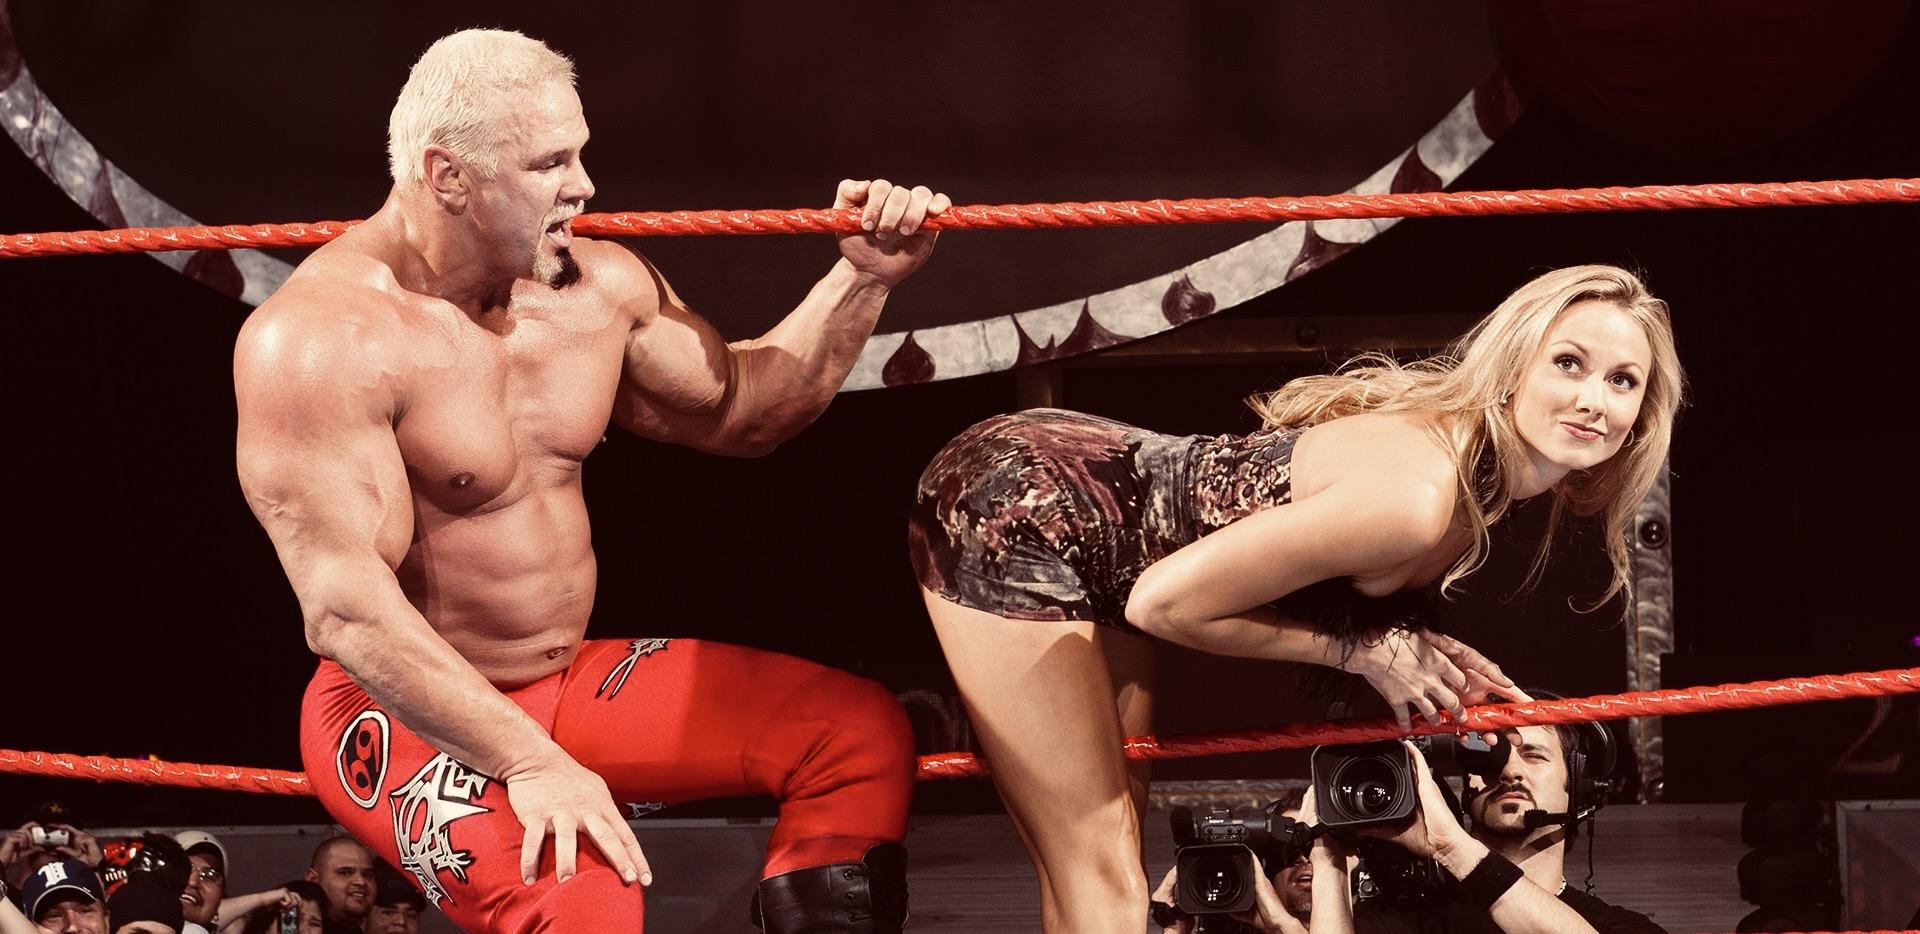 Scott Steiner vs. Triple H Rivalry Documentary Video